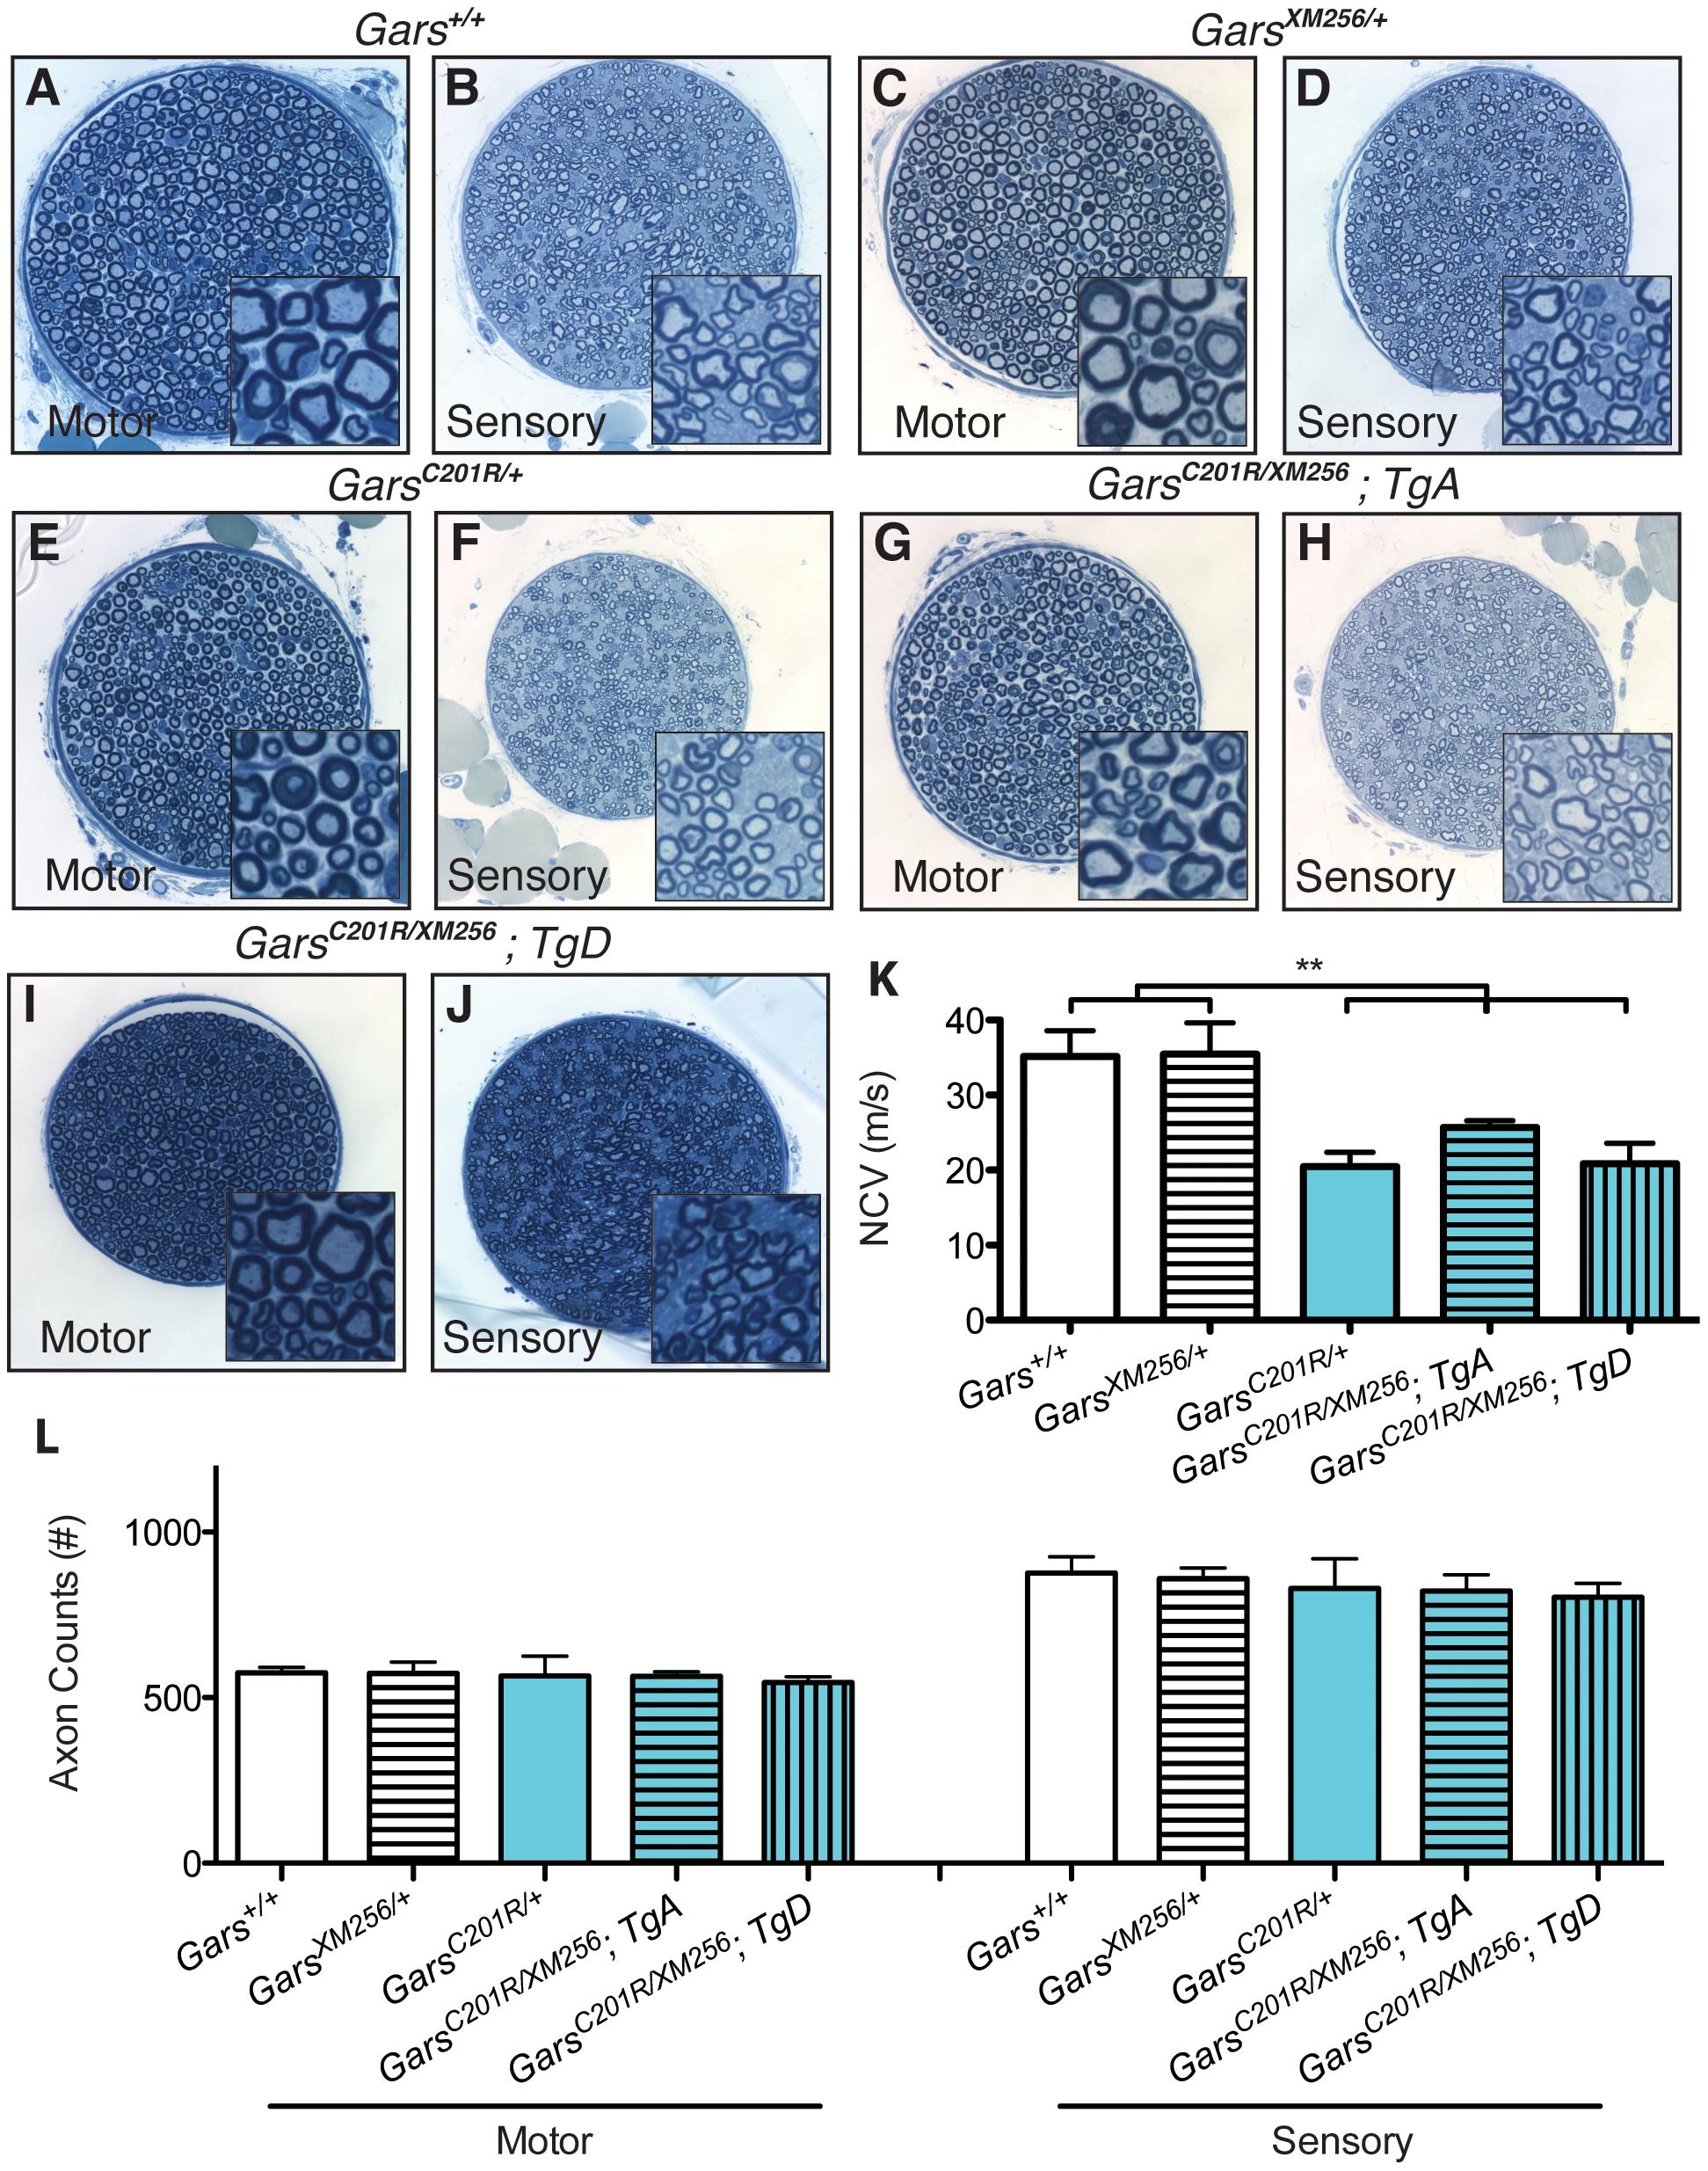 Transgenes A and D restore viability to <i>C201R/XM256</i> mice.